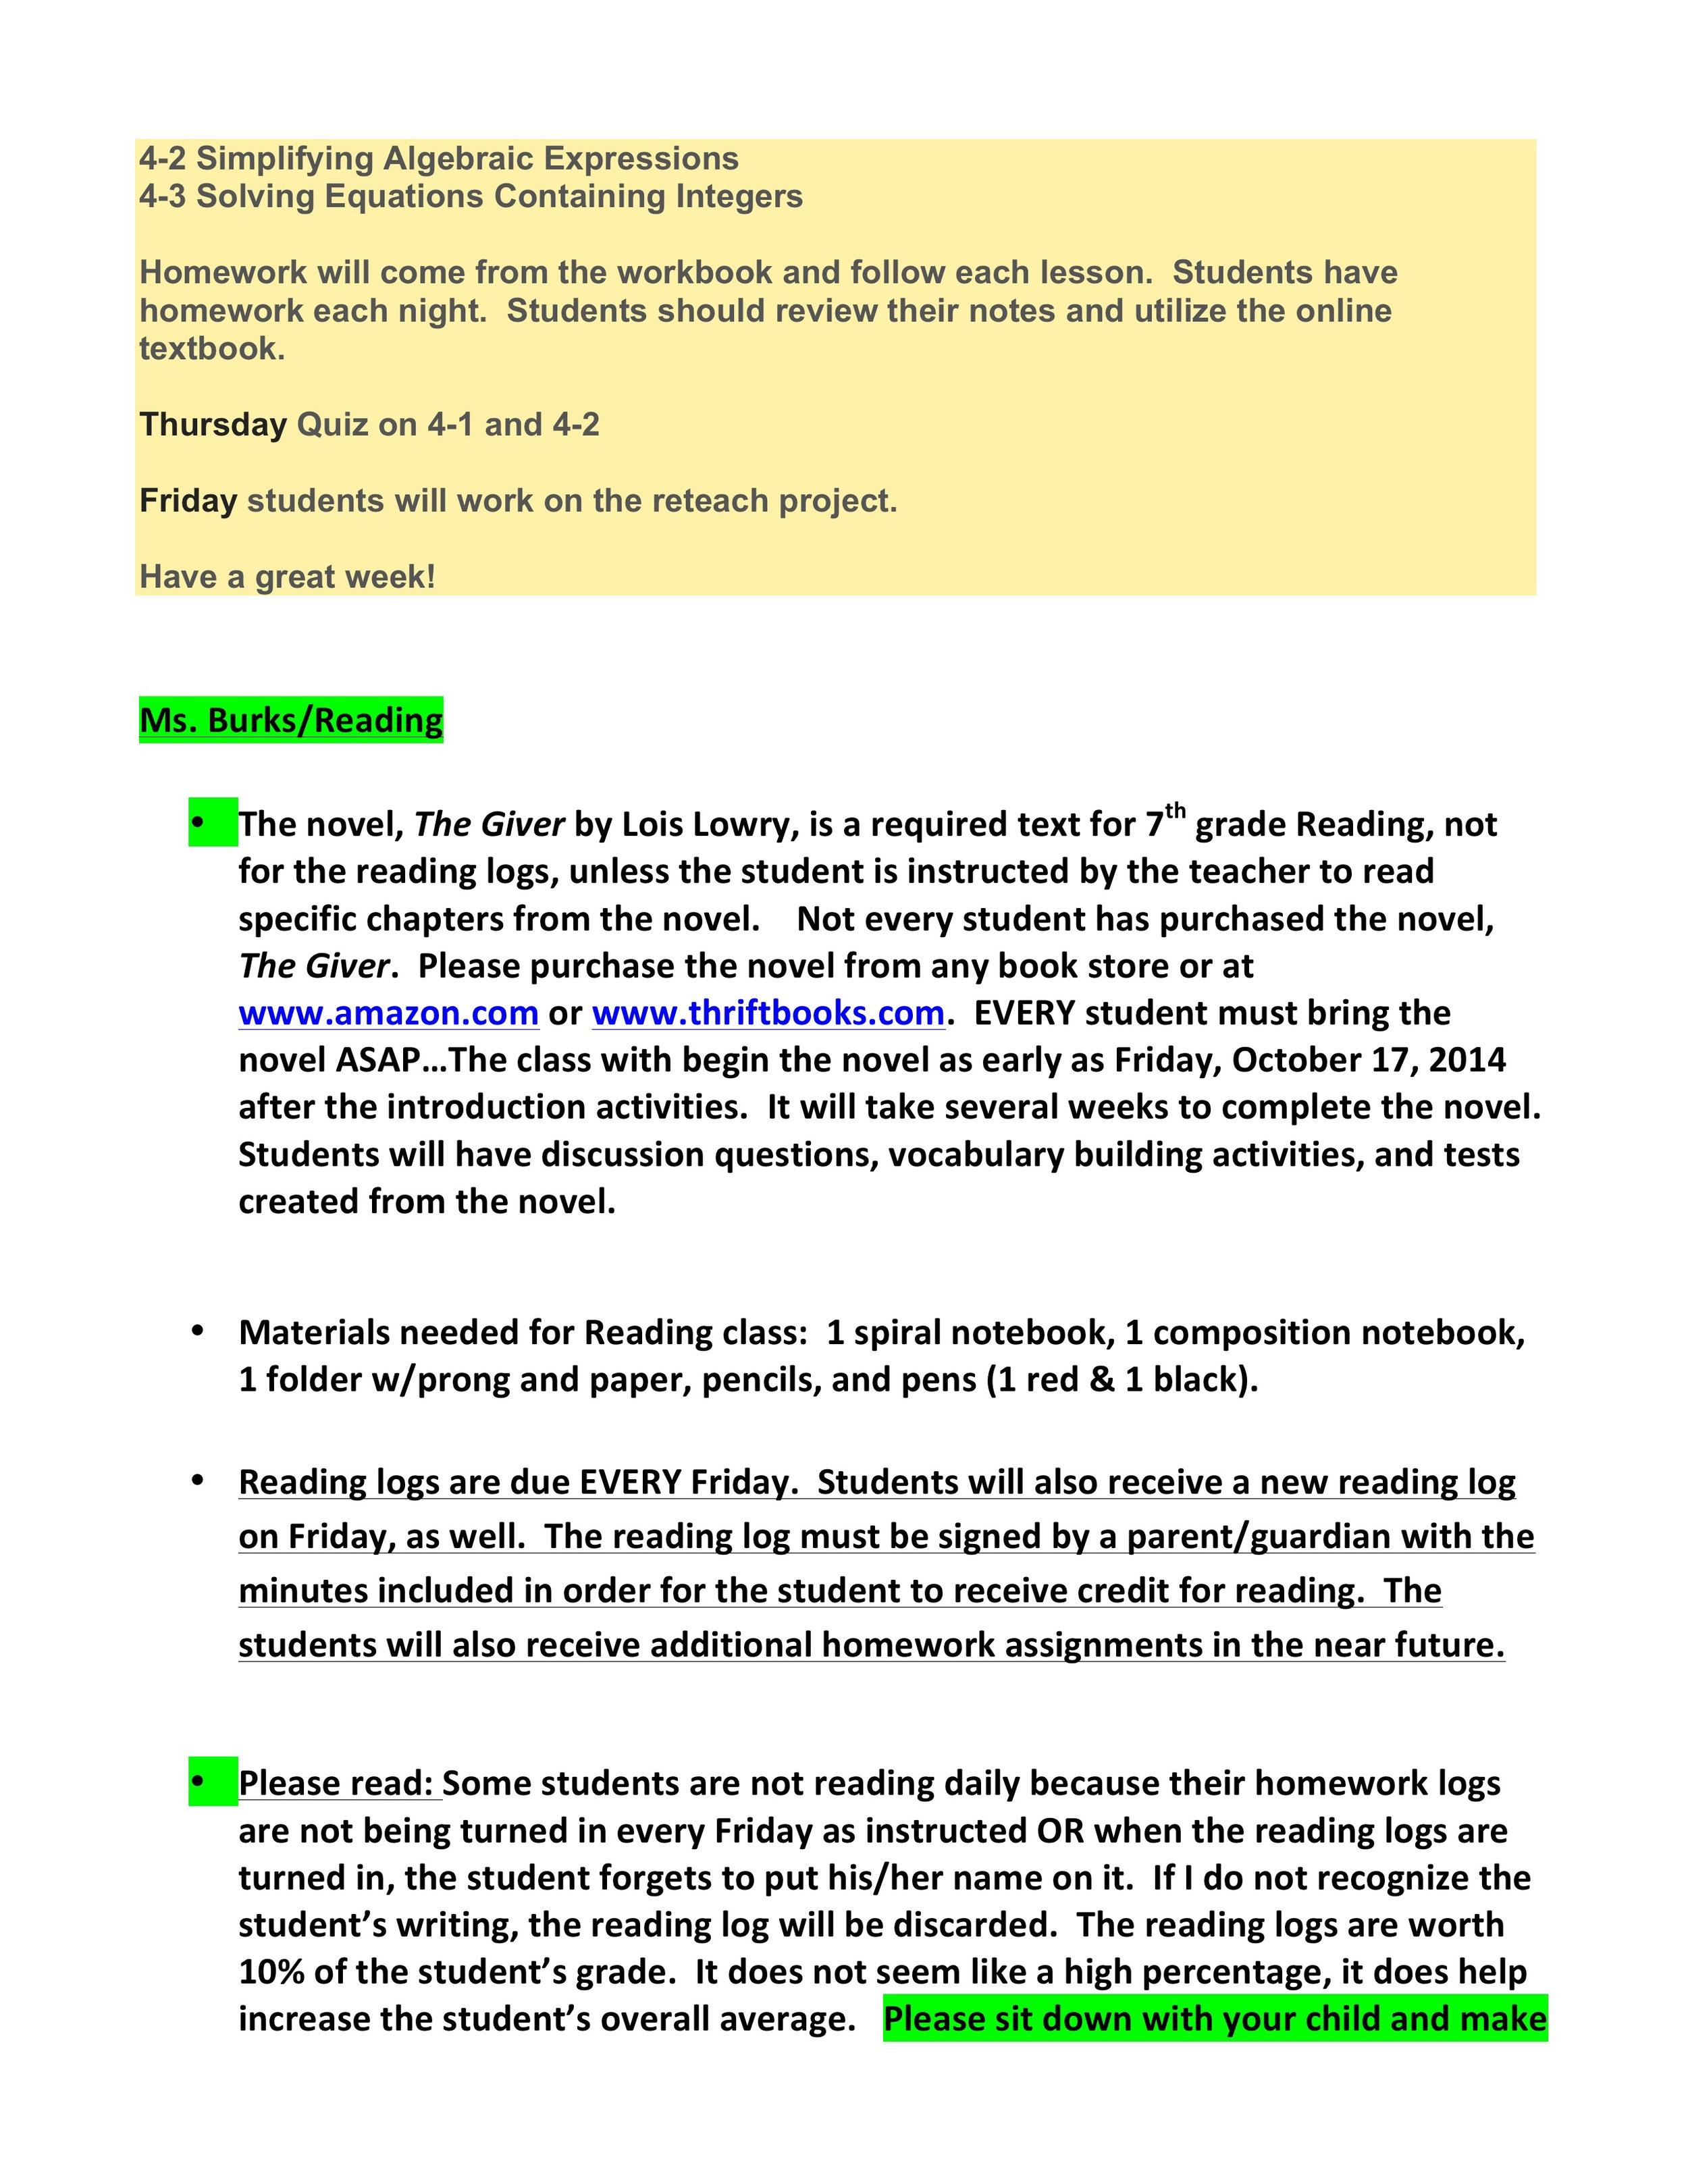 Newsletter Image7th grade 10-20 2.jpeg